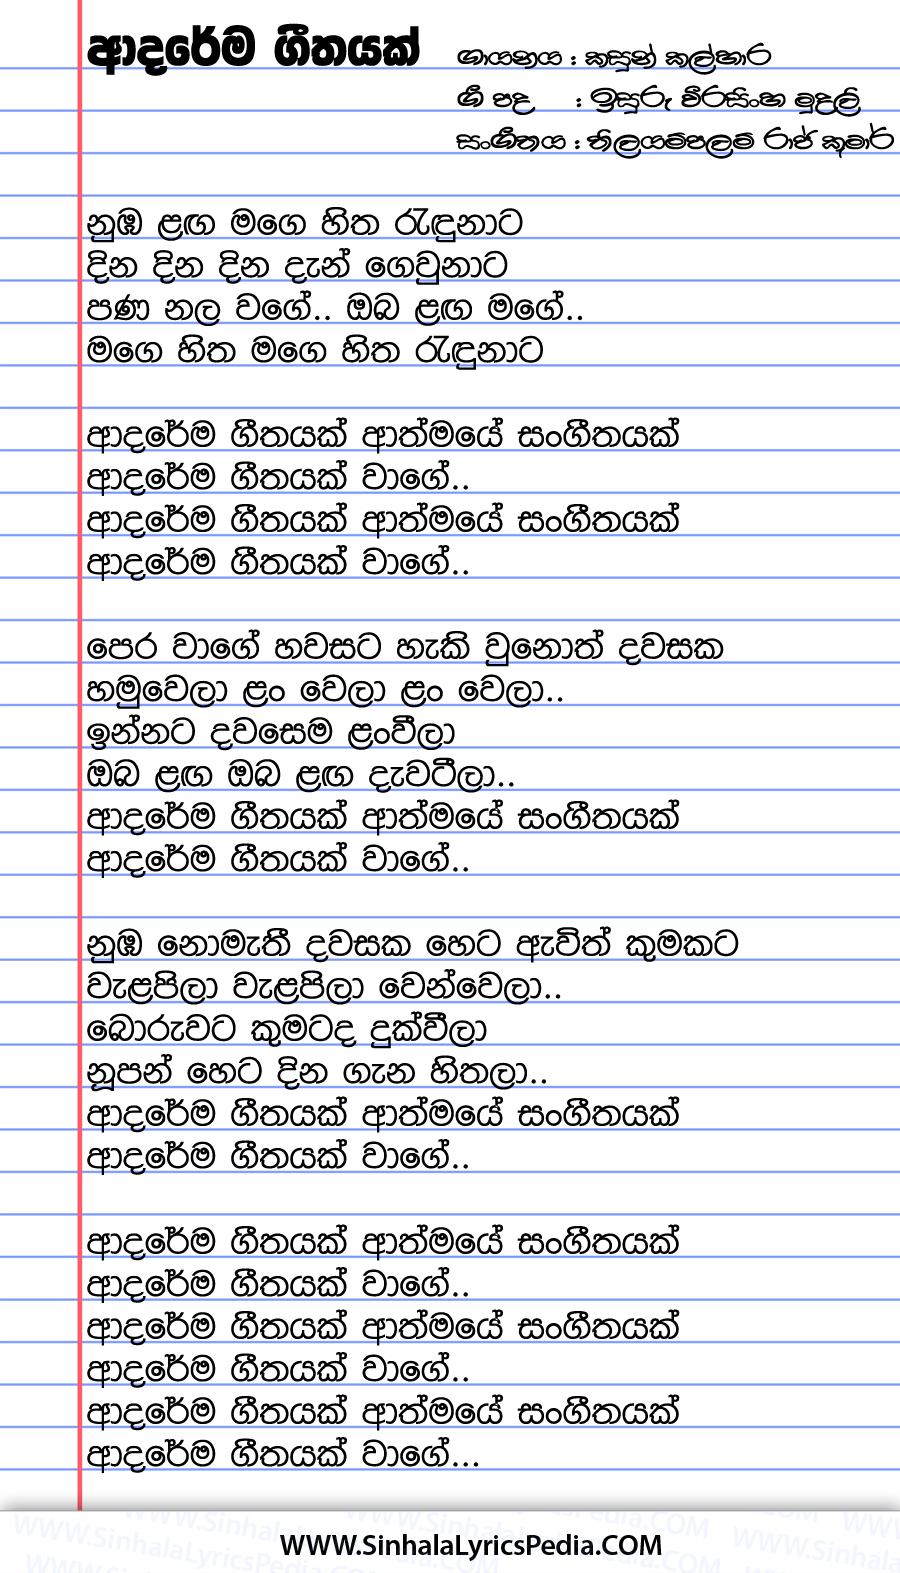 Adarema Geethayak Song Lyrics